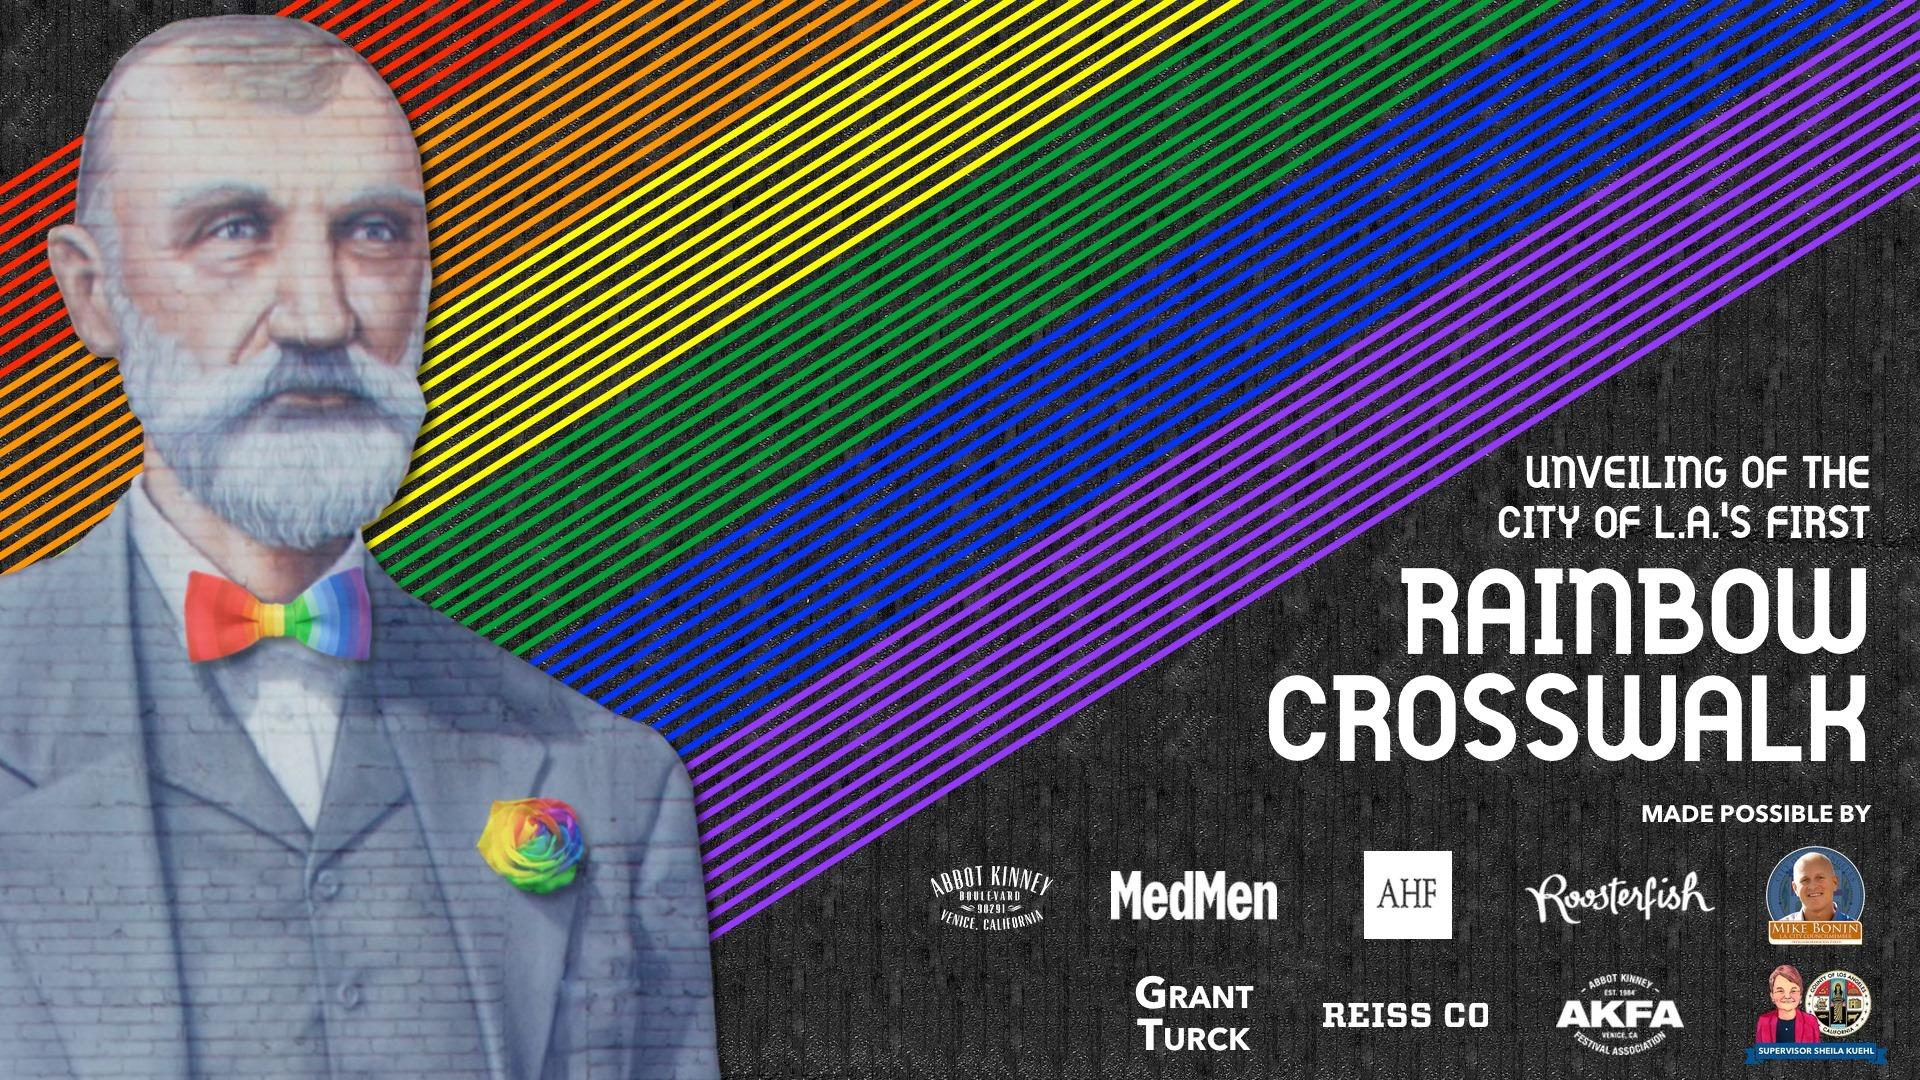 Abbot-Kinney-Rainbow-Crosswalk.jpg